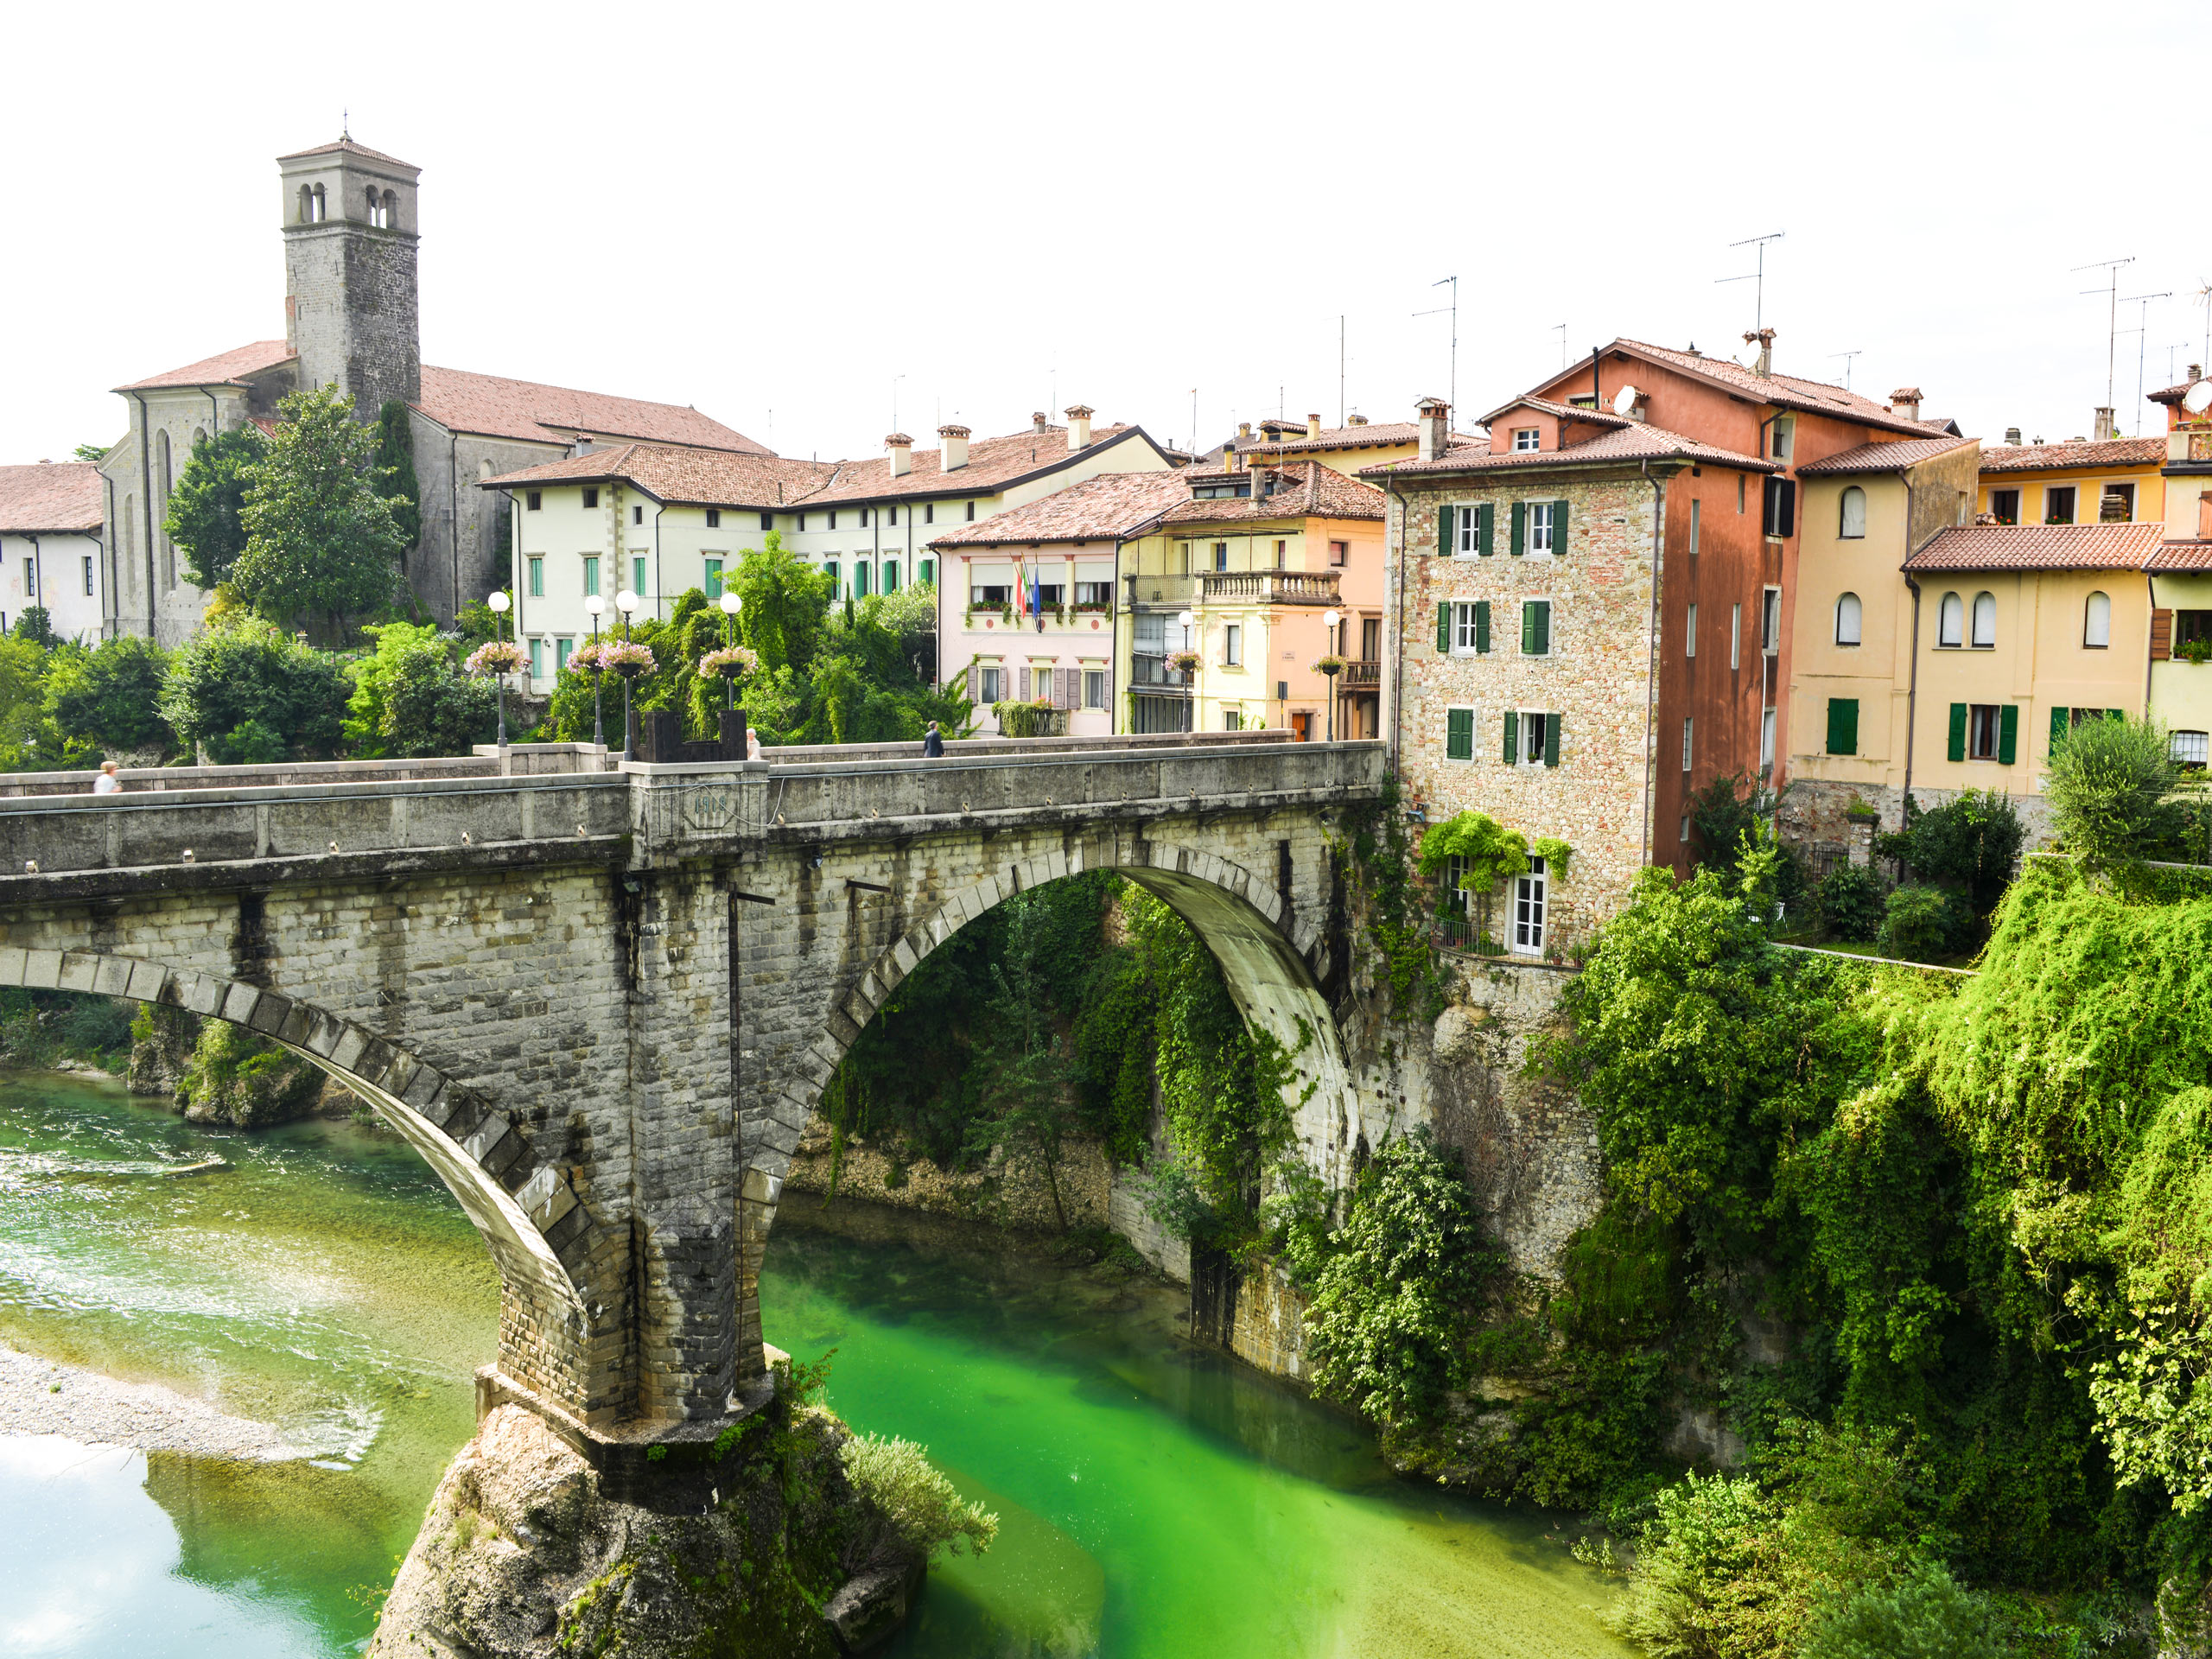 Beautiful bridge in Italy